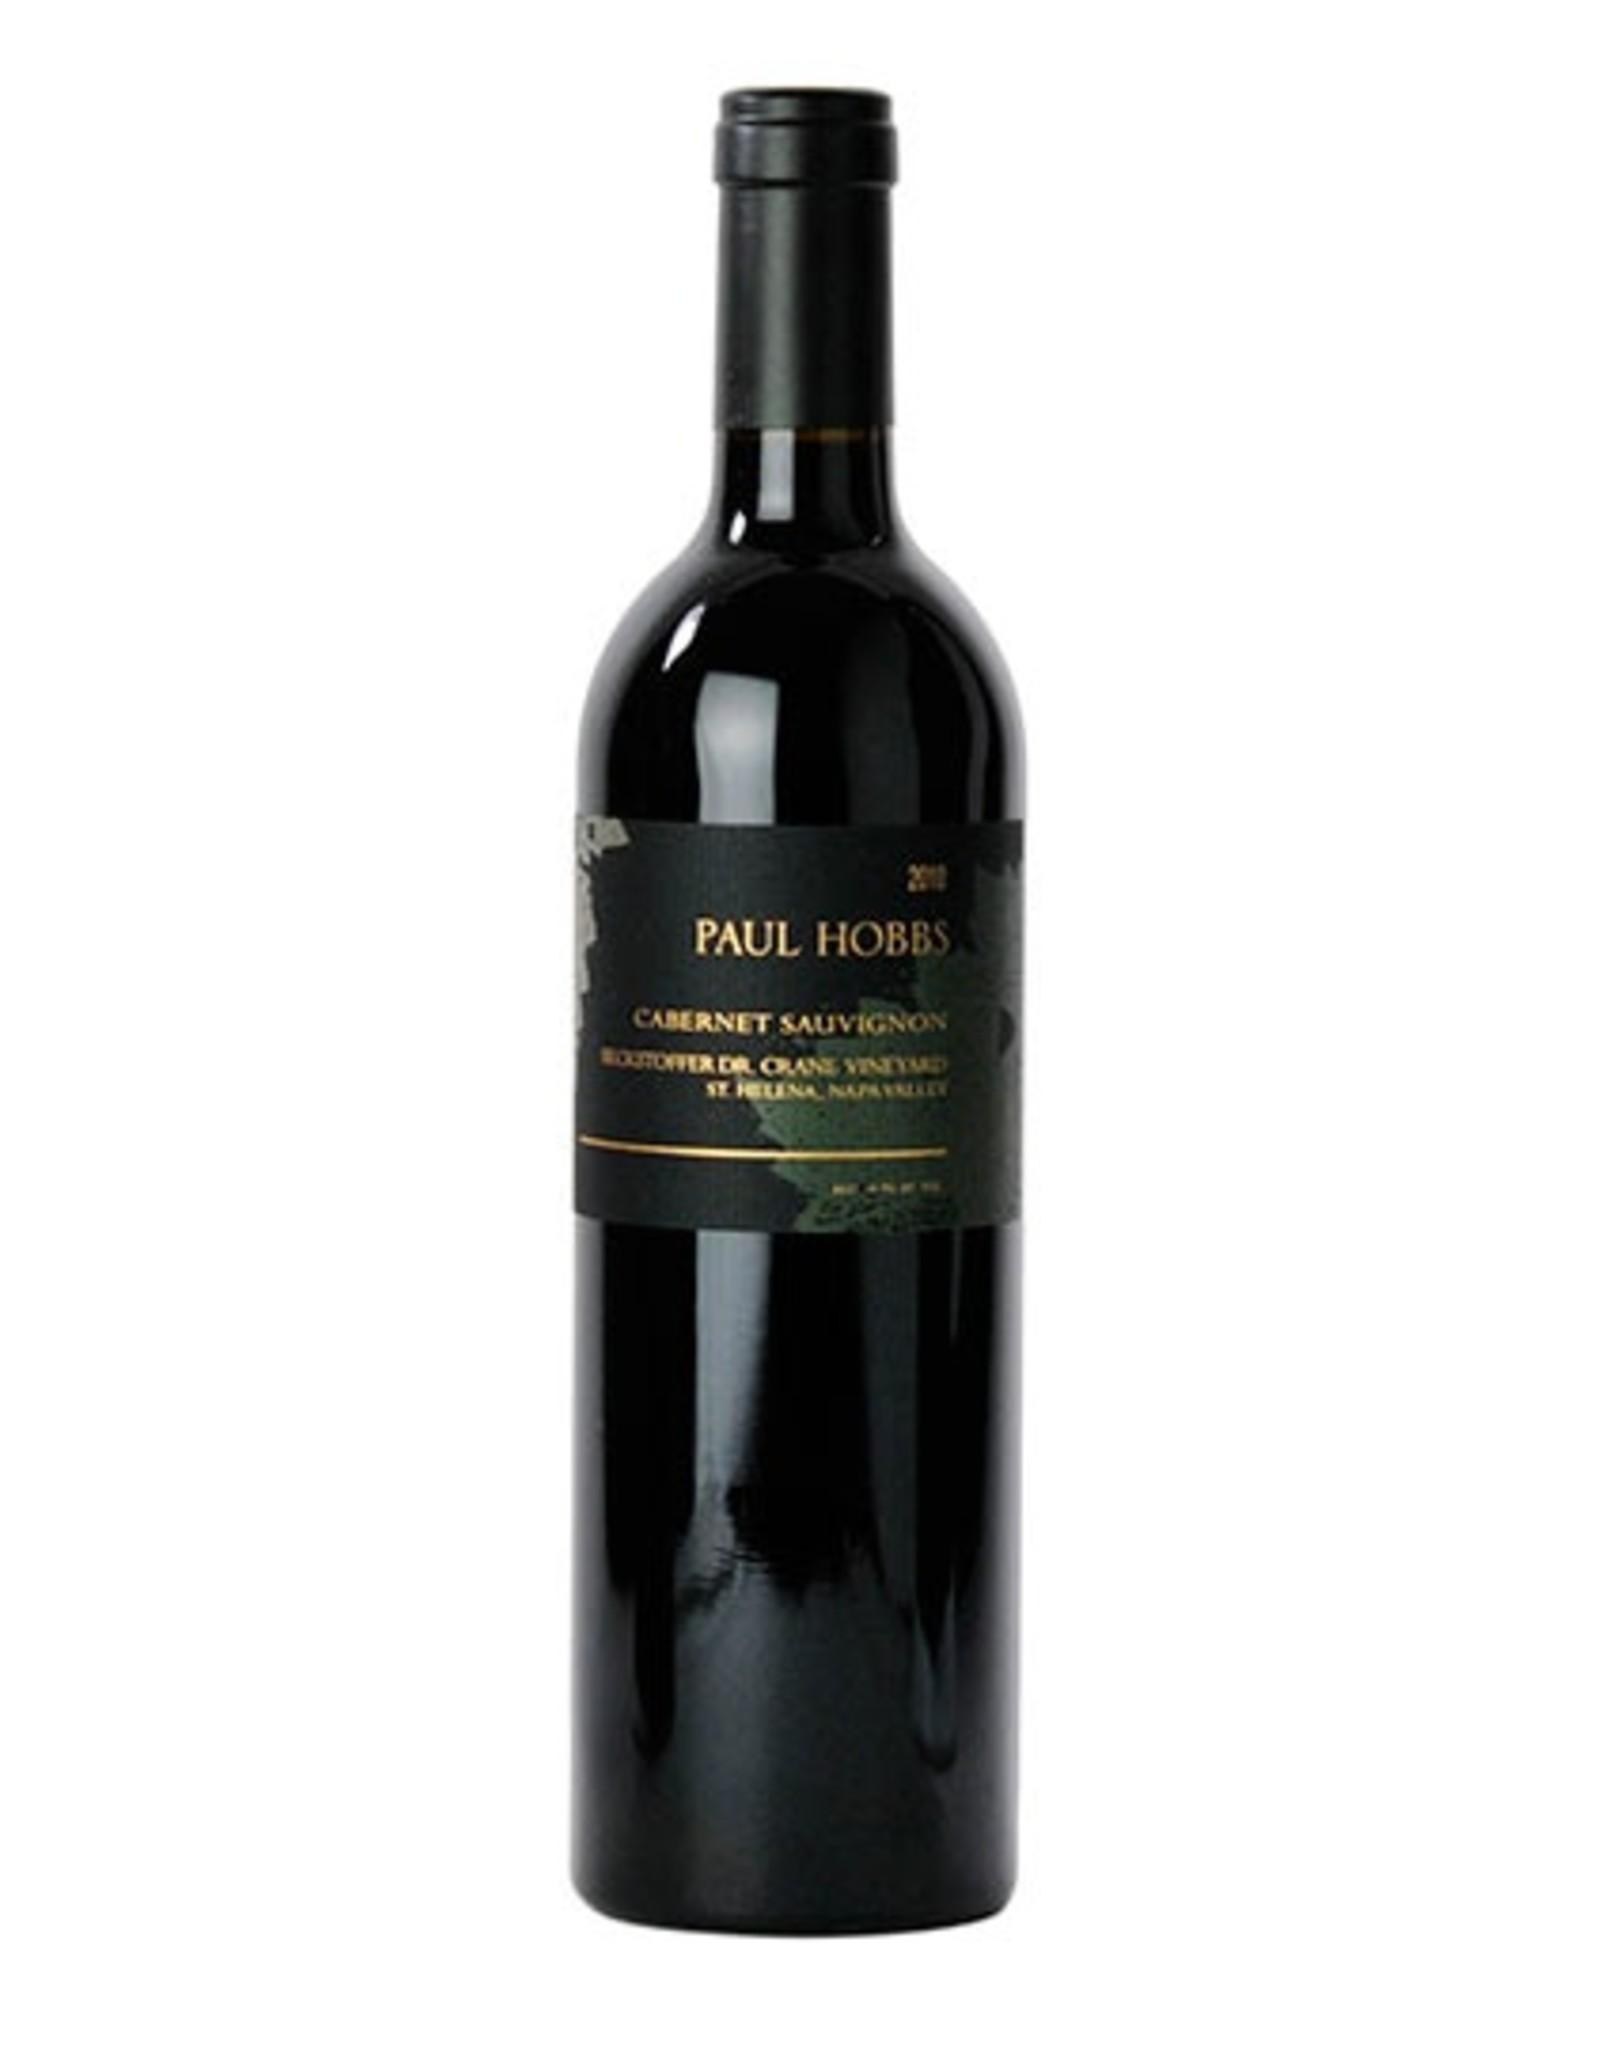 Red Wine 2014, Paul Hobbs Beckstoffer Dr. Crane Vineyard, Cabernet Sauvignon, St. Helena, Napa Valley, California, 14.5% Alc, CT94, RP100